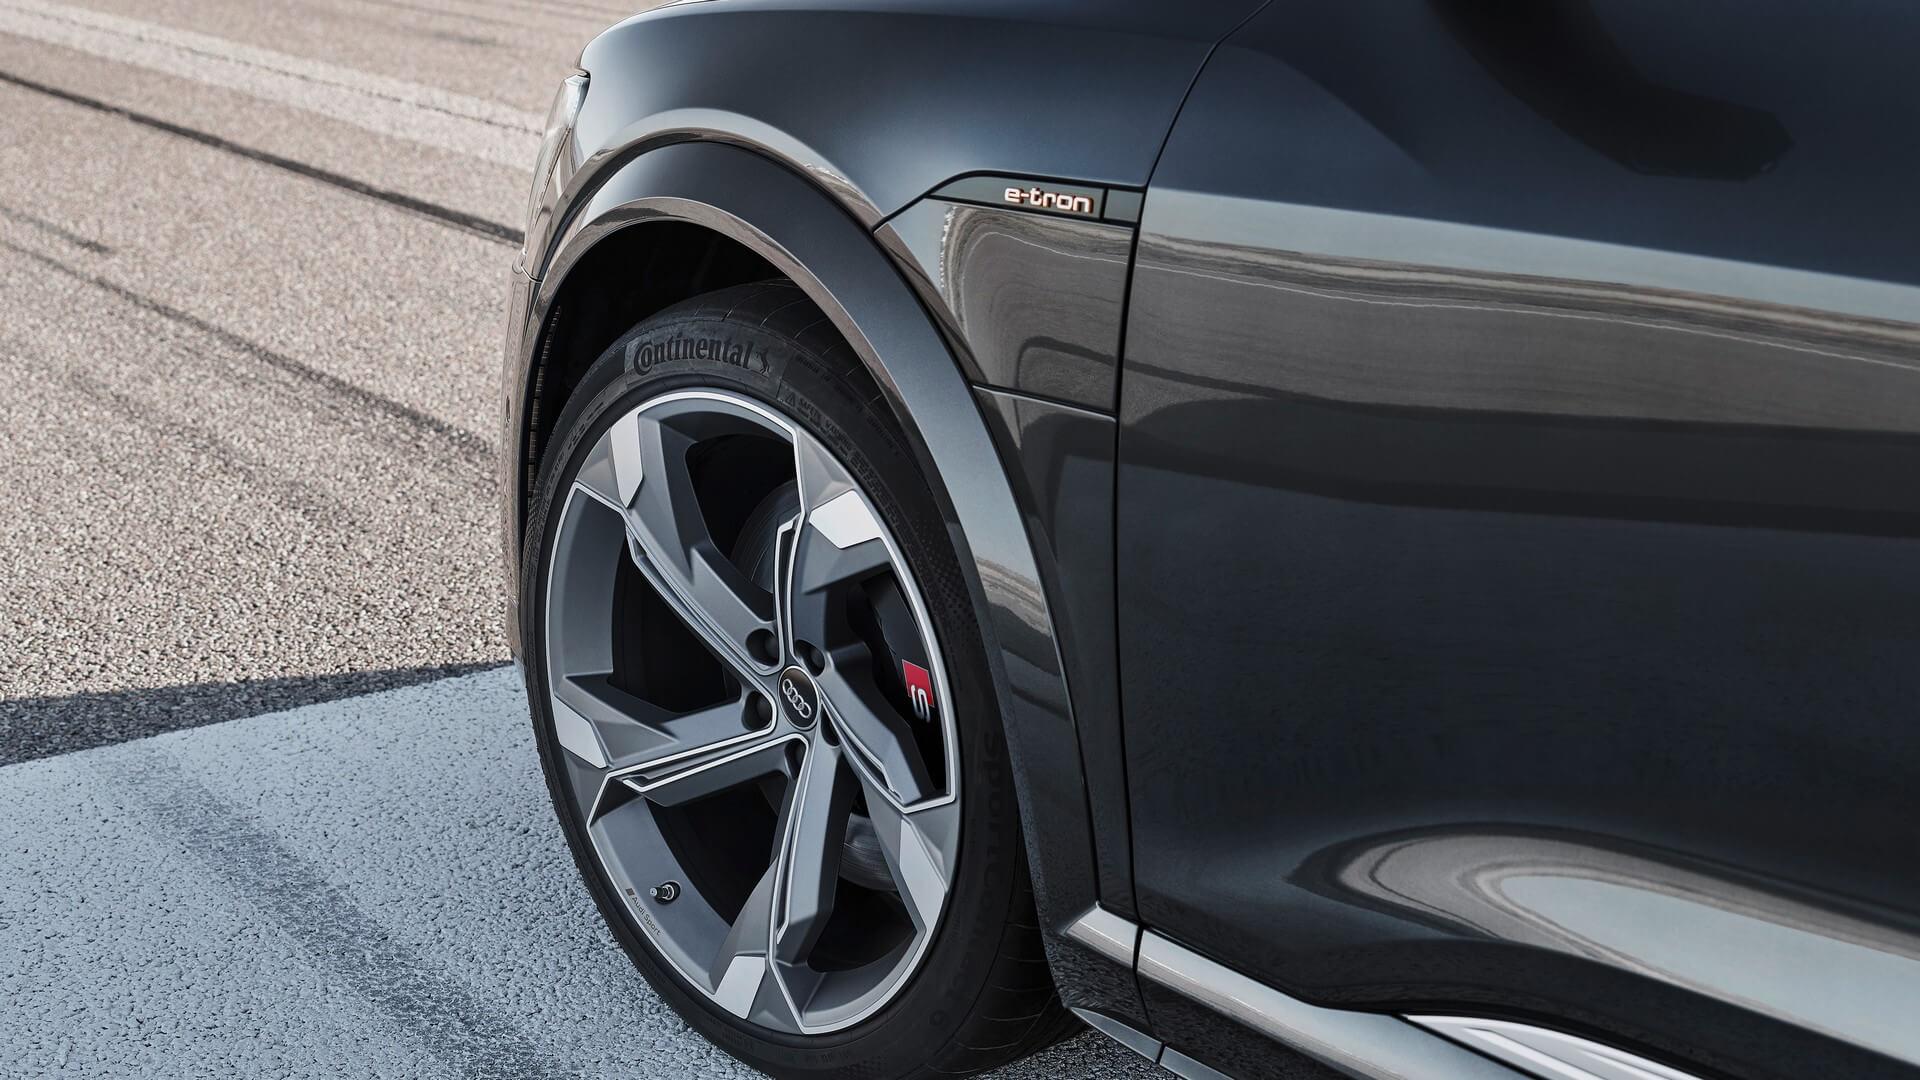 Audi-E-Tron-S-and-E-Tron-S-Sportback-2020-100